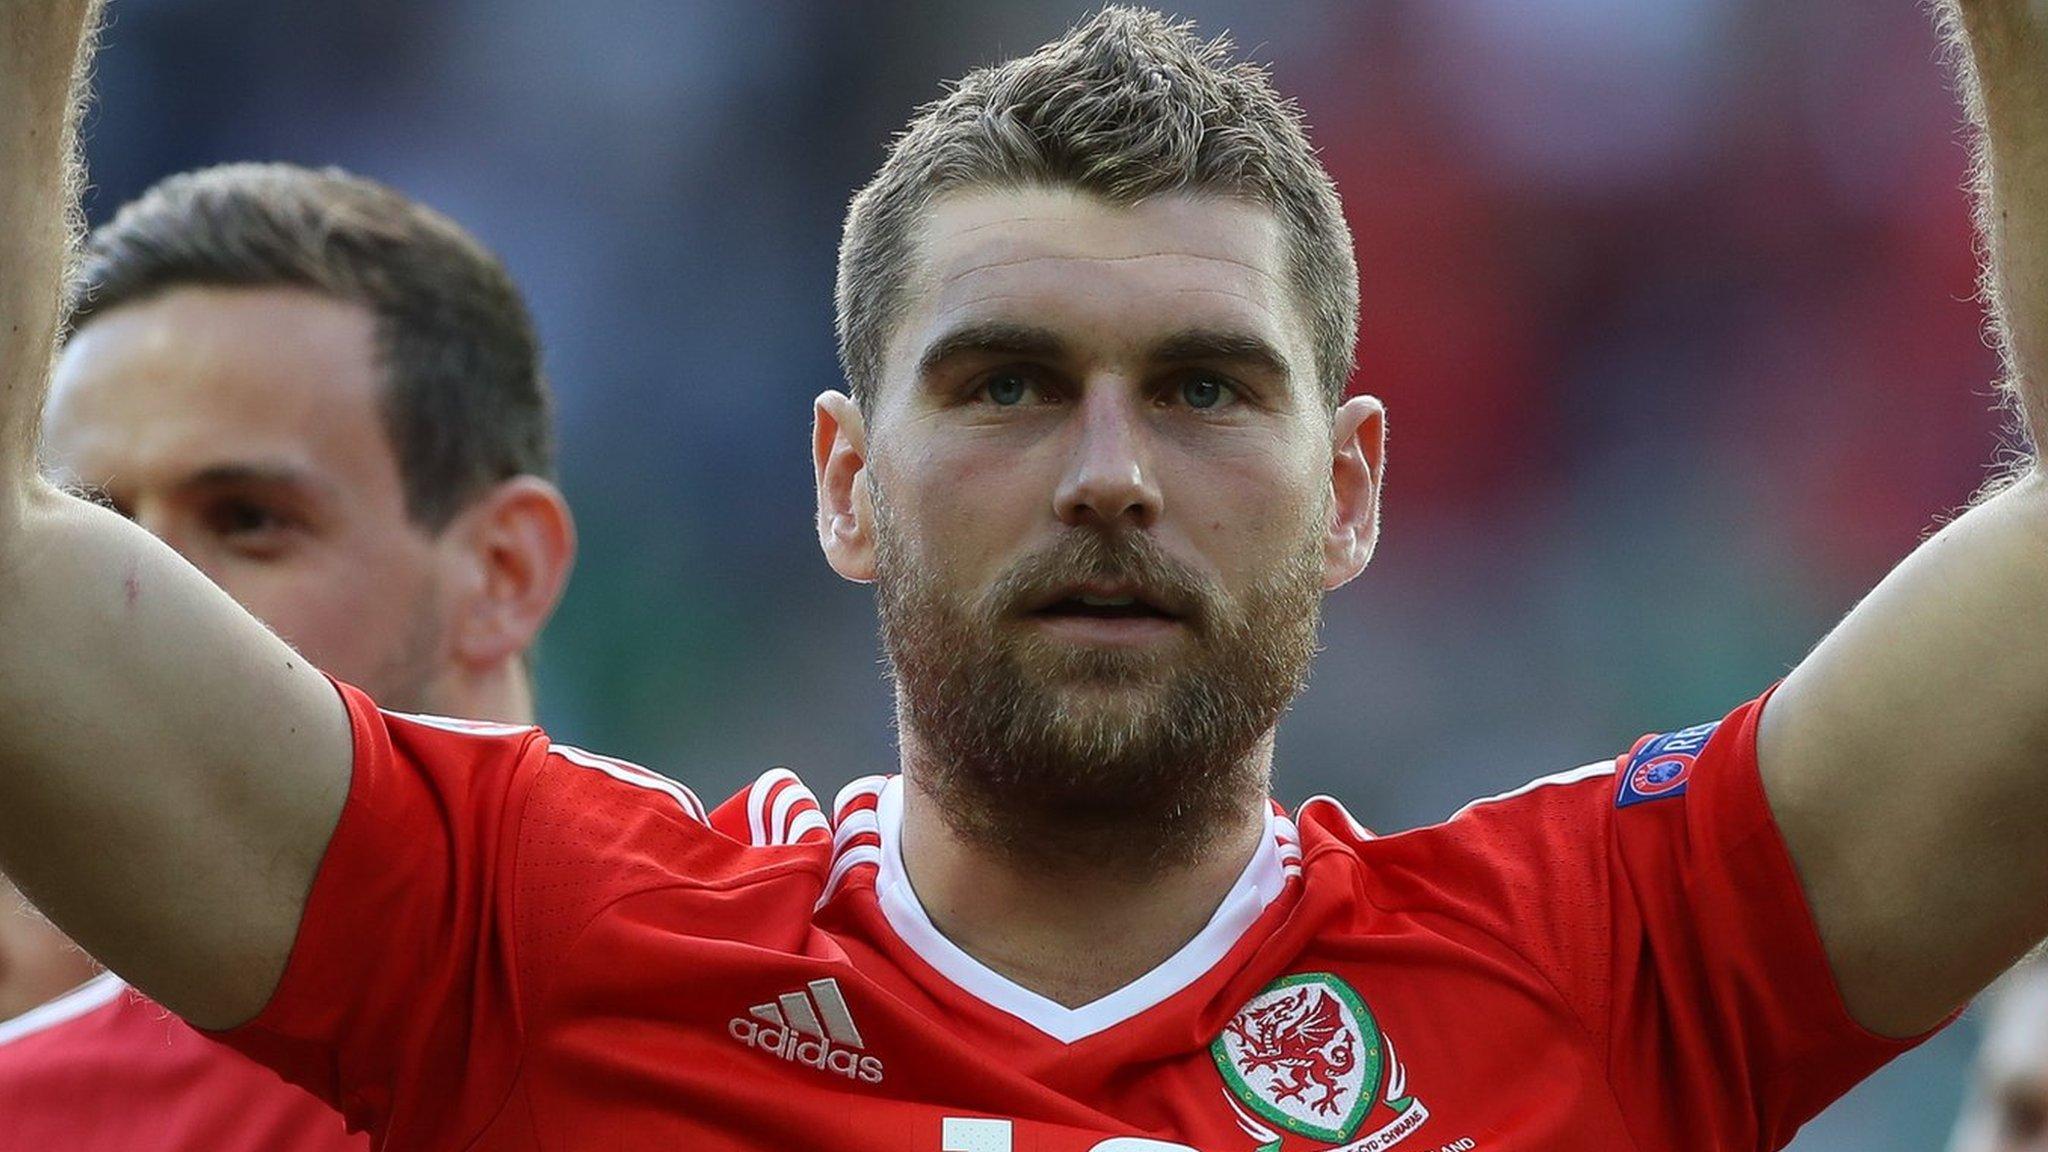 Feed Vokes, stop Hazard - how Wales can beat Belgium